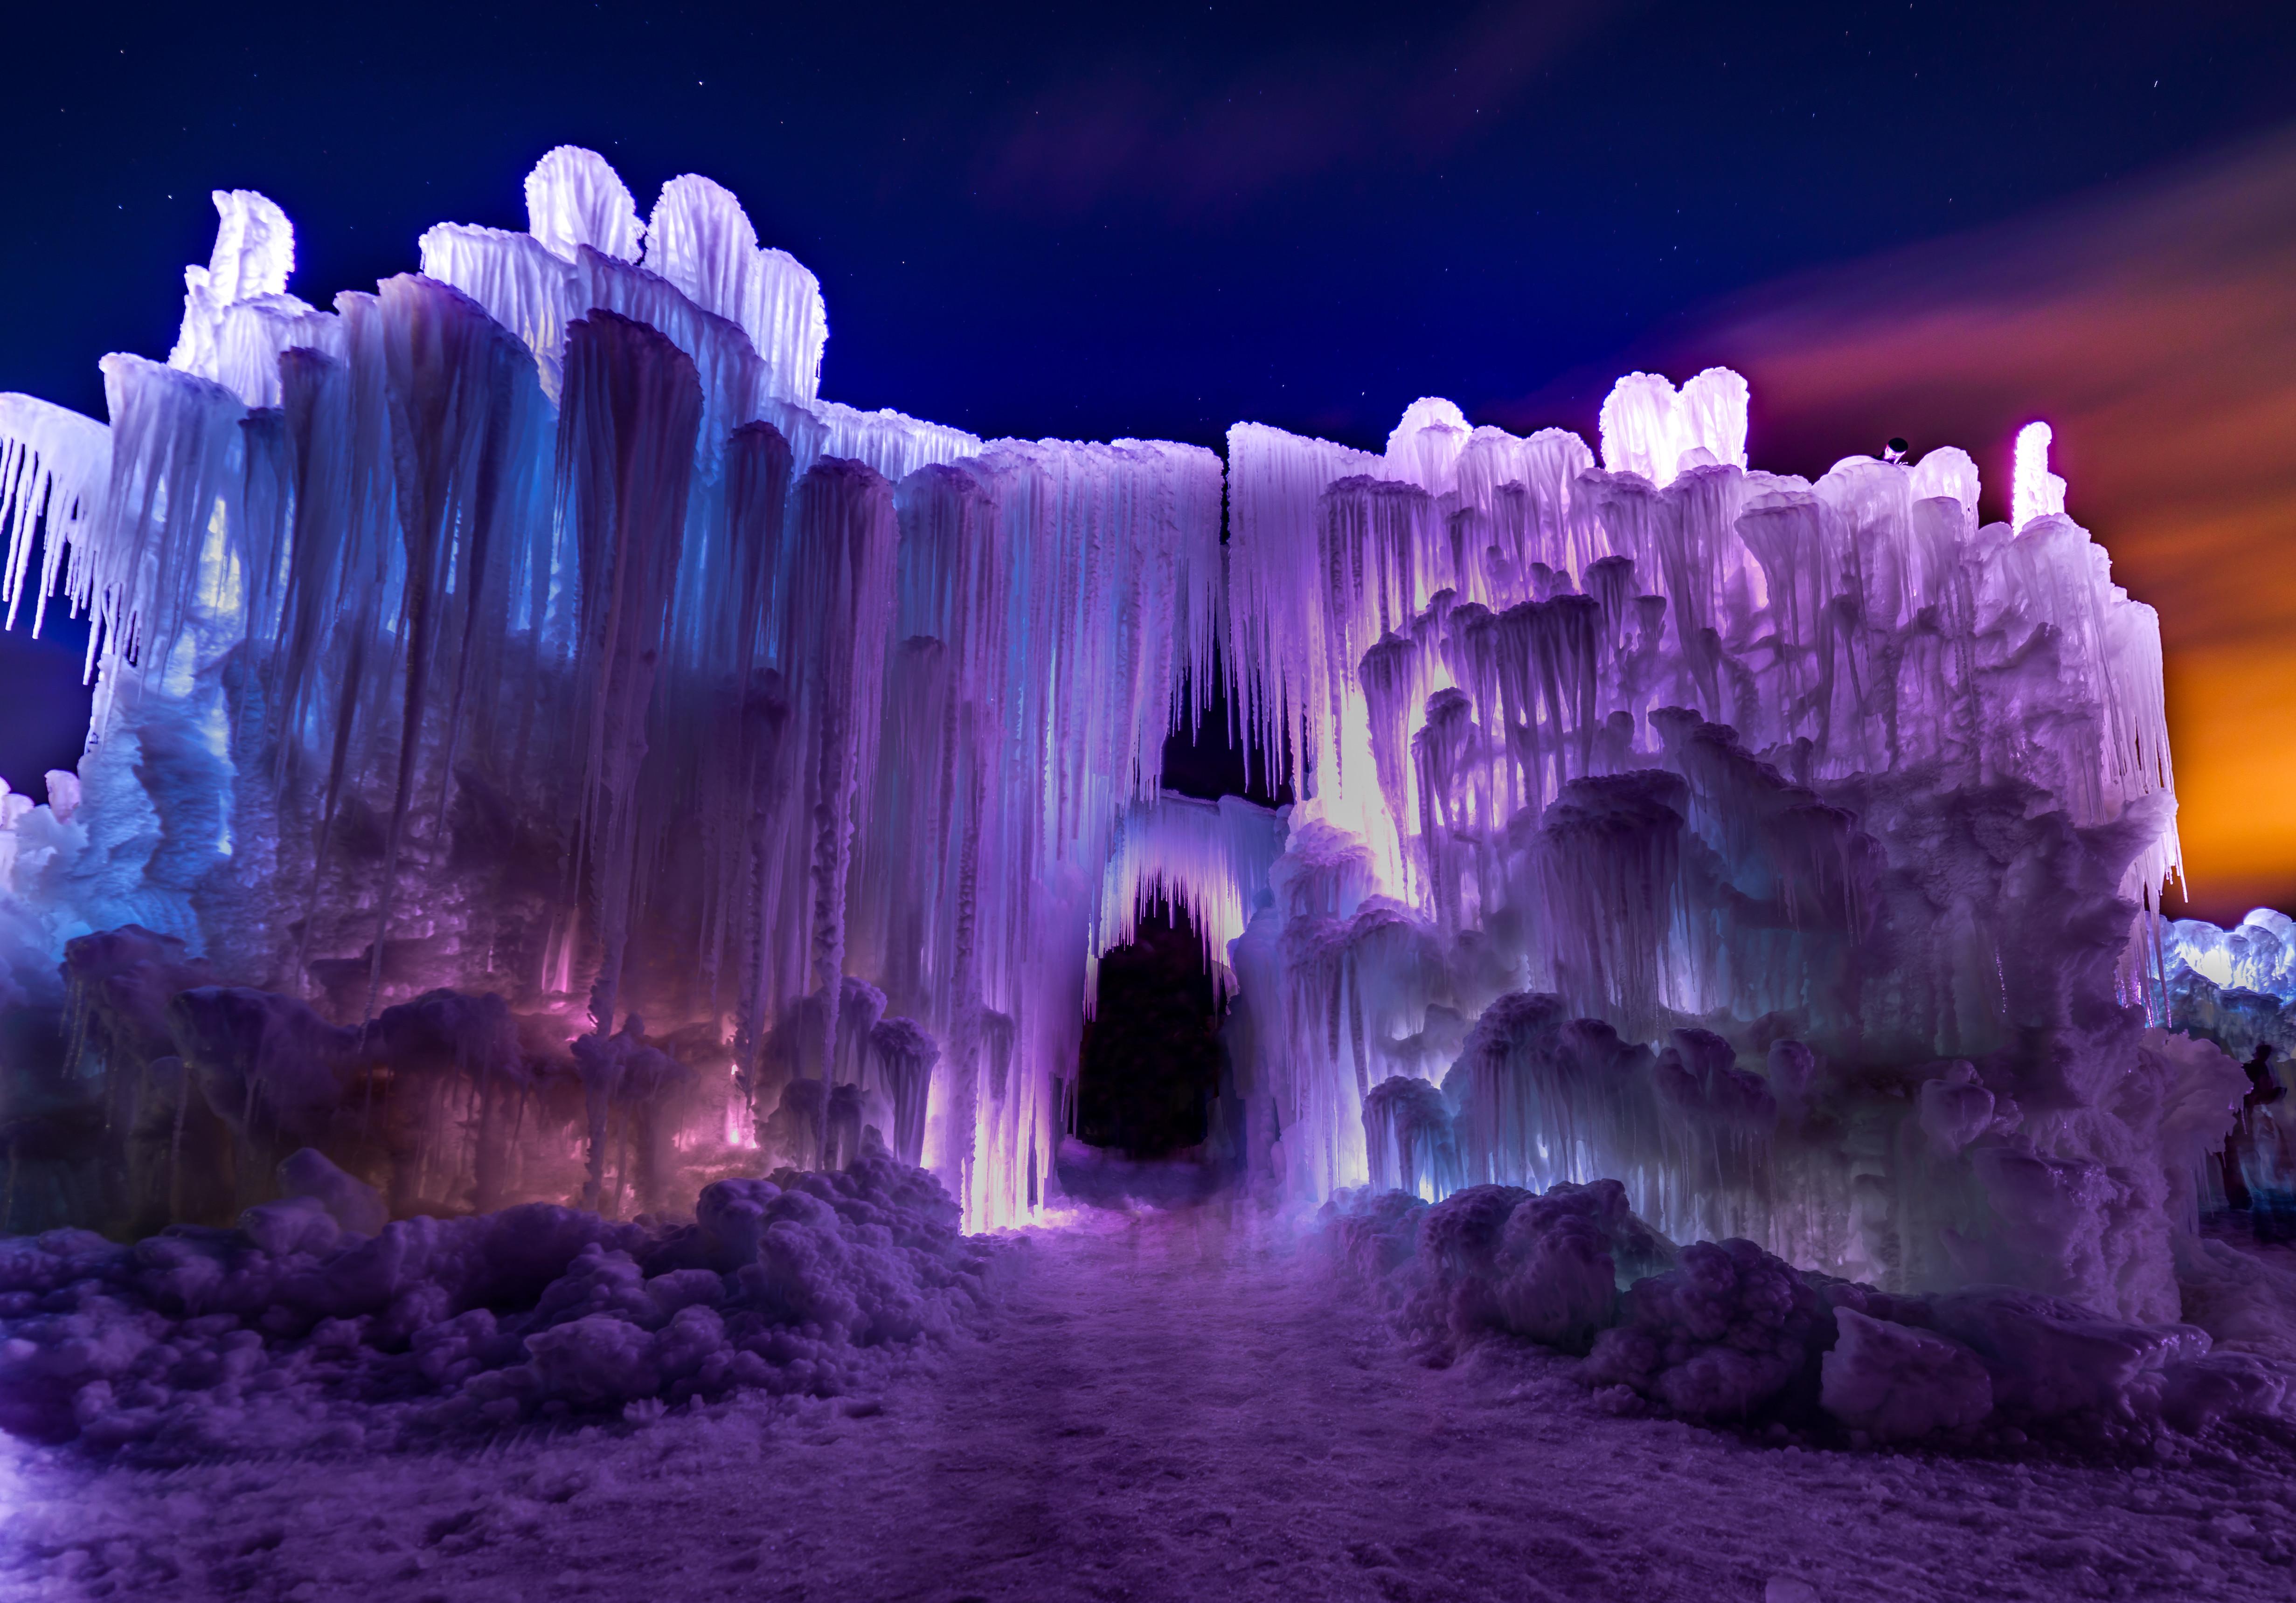 ice castle by kimesama - photo #48